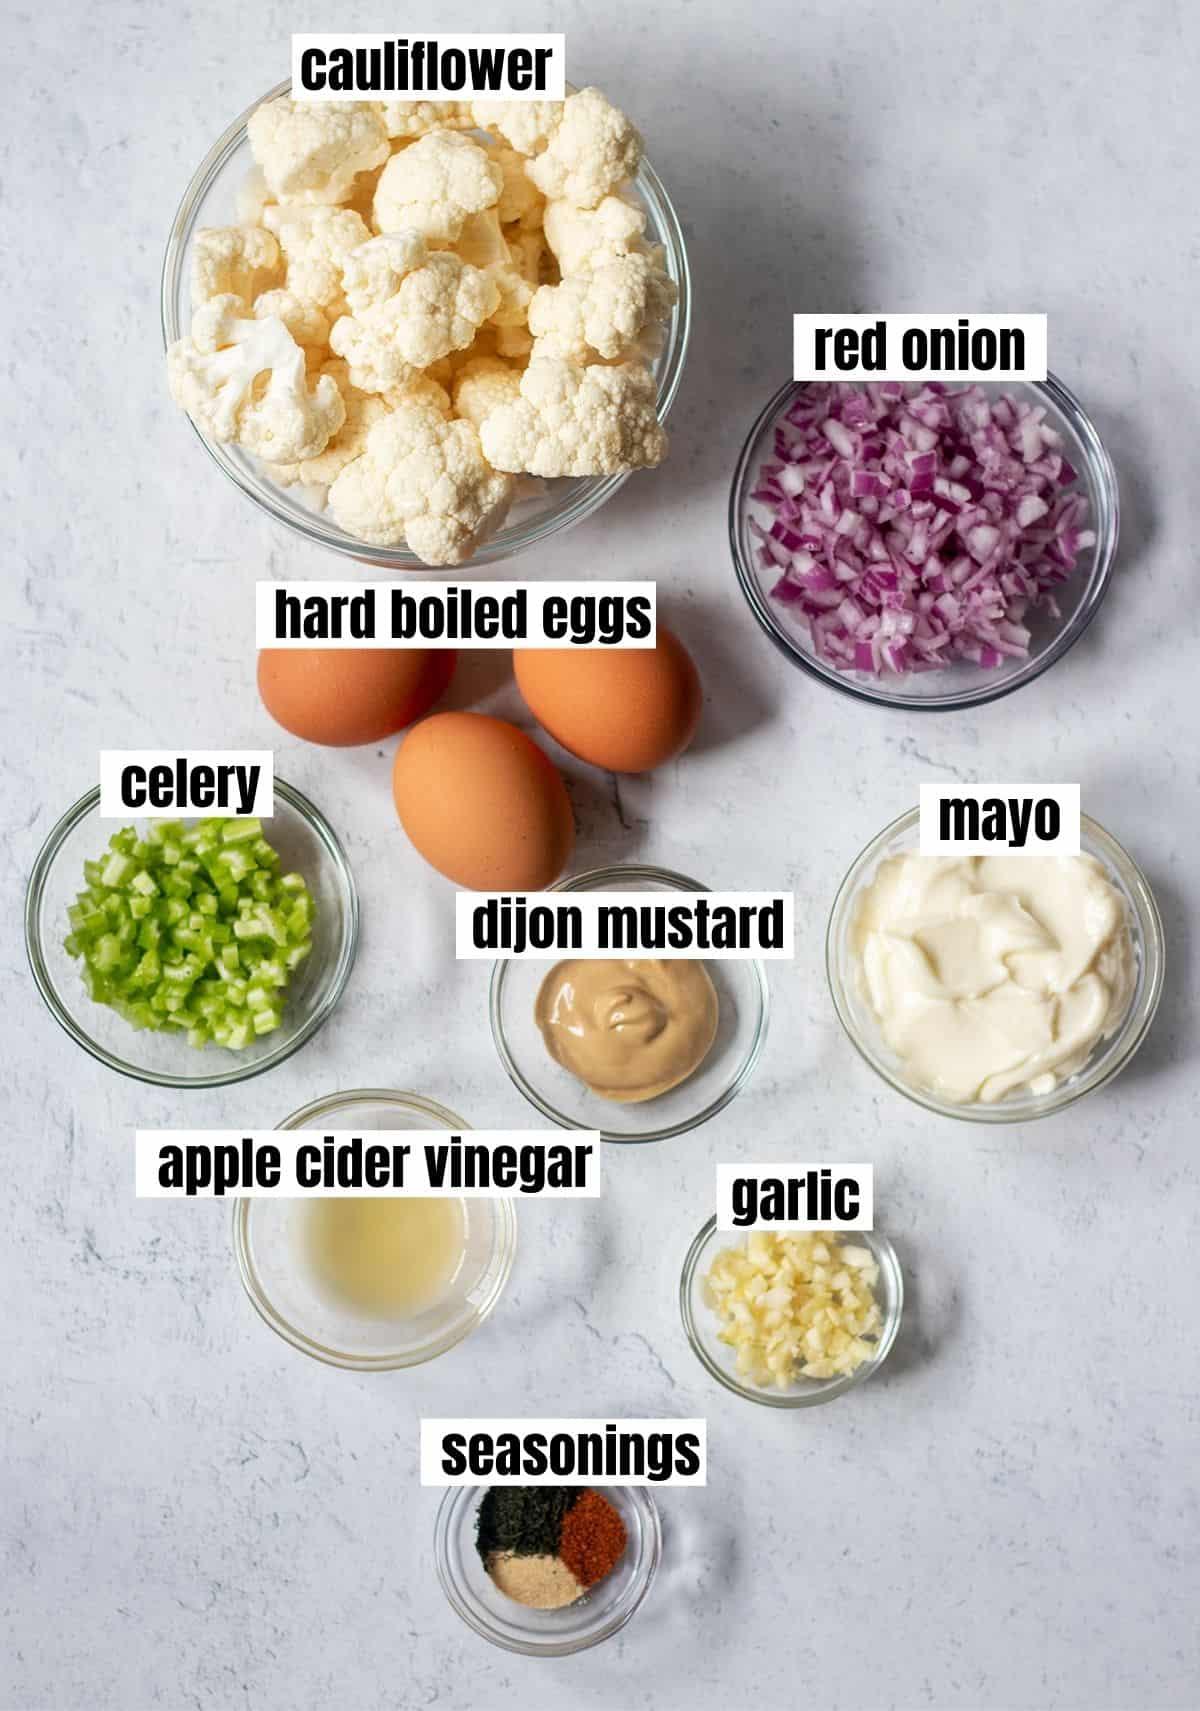 cauliflower, red onion, hard boiled eggs, celery, dijon mustard, mayo, apple cider vinegar, garlic and seasonings.